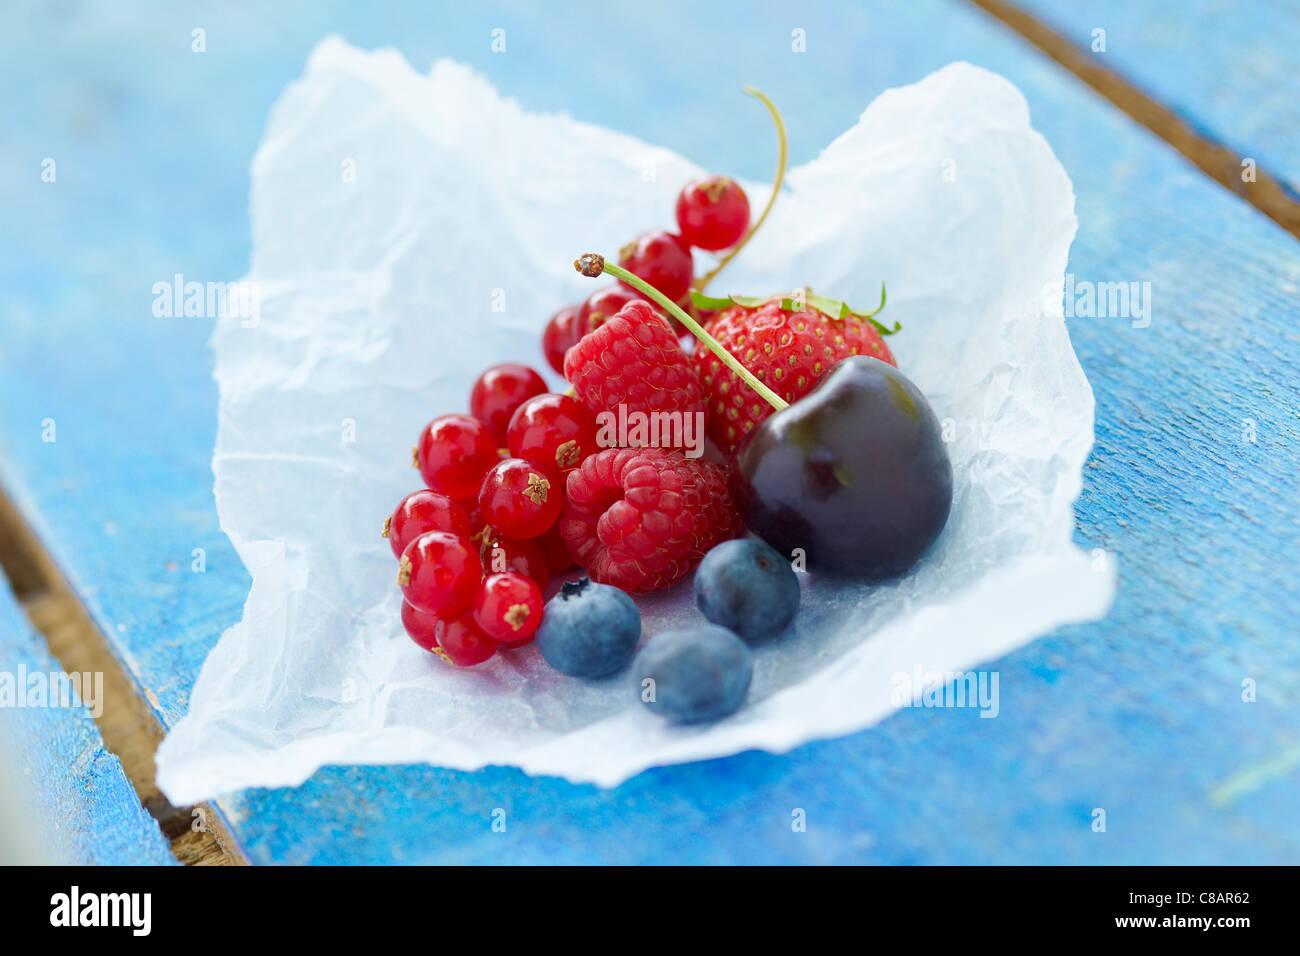 Assorted summer fruit - Stock Image